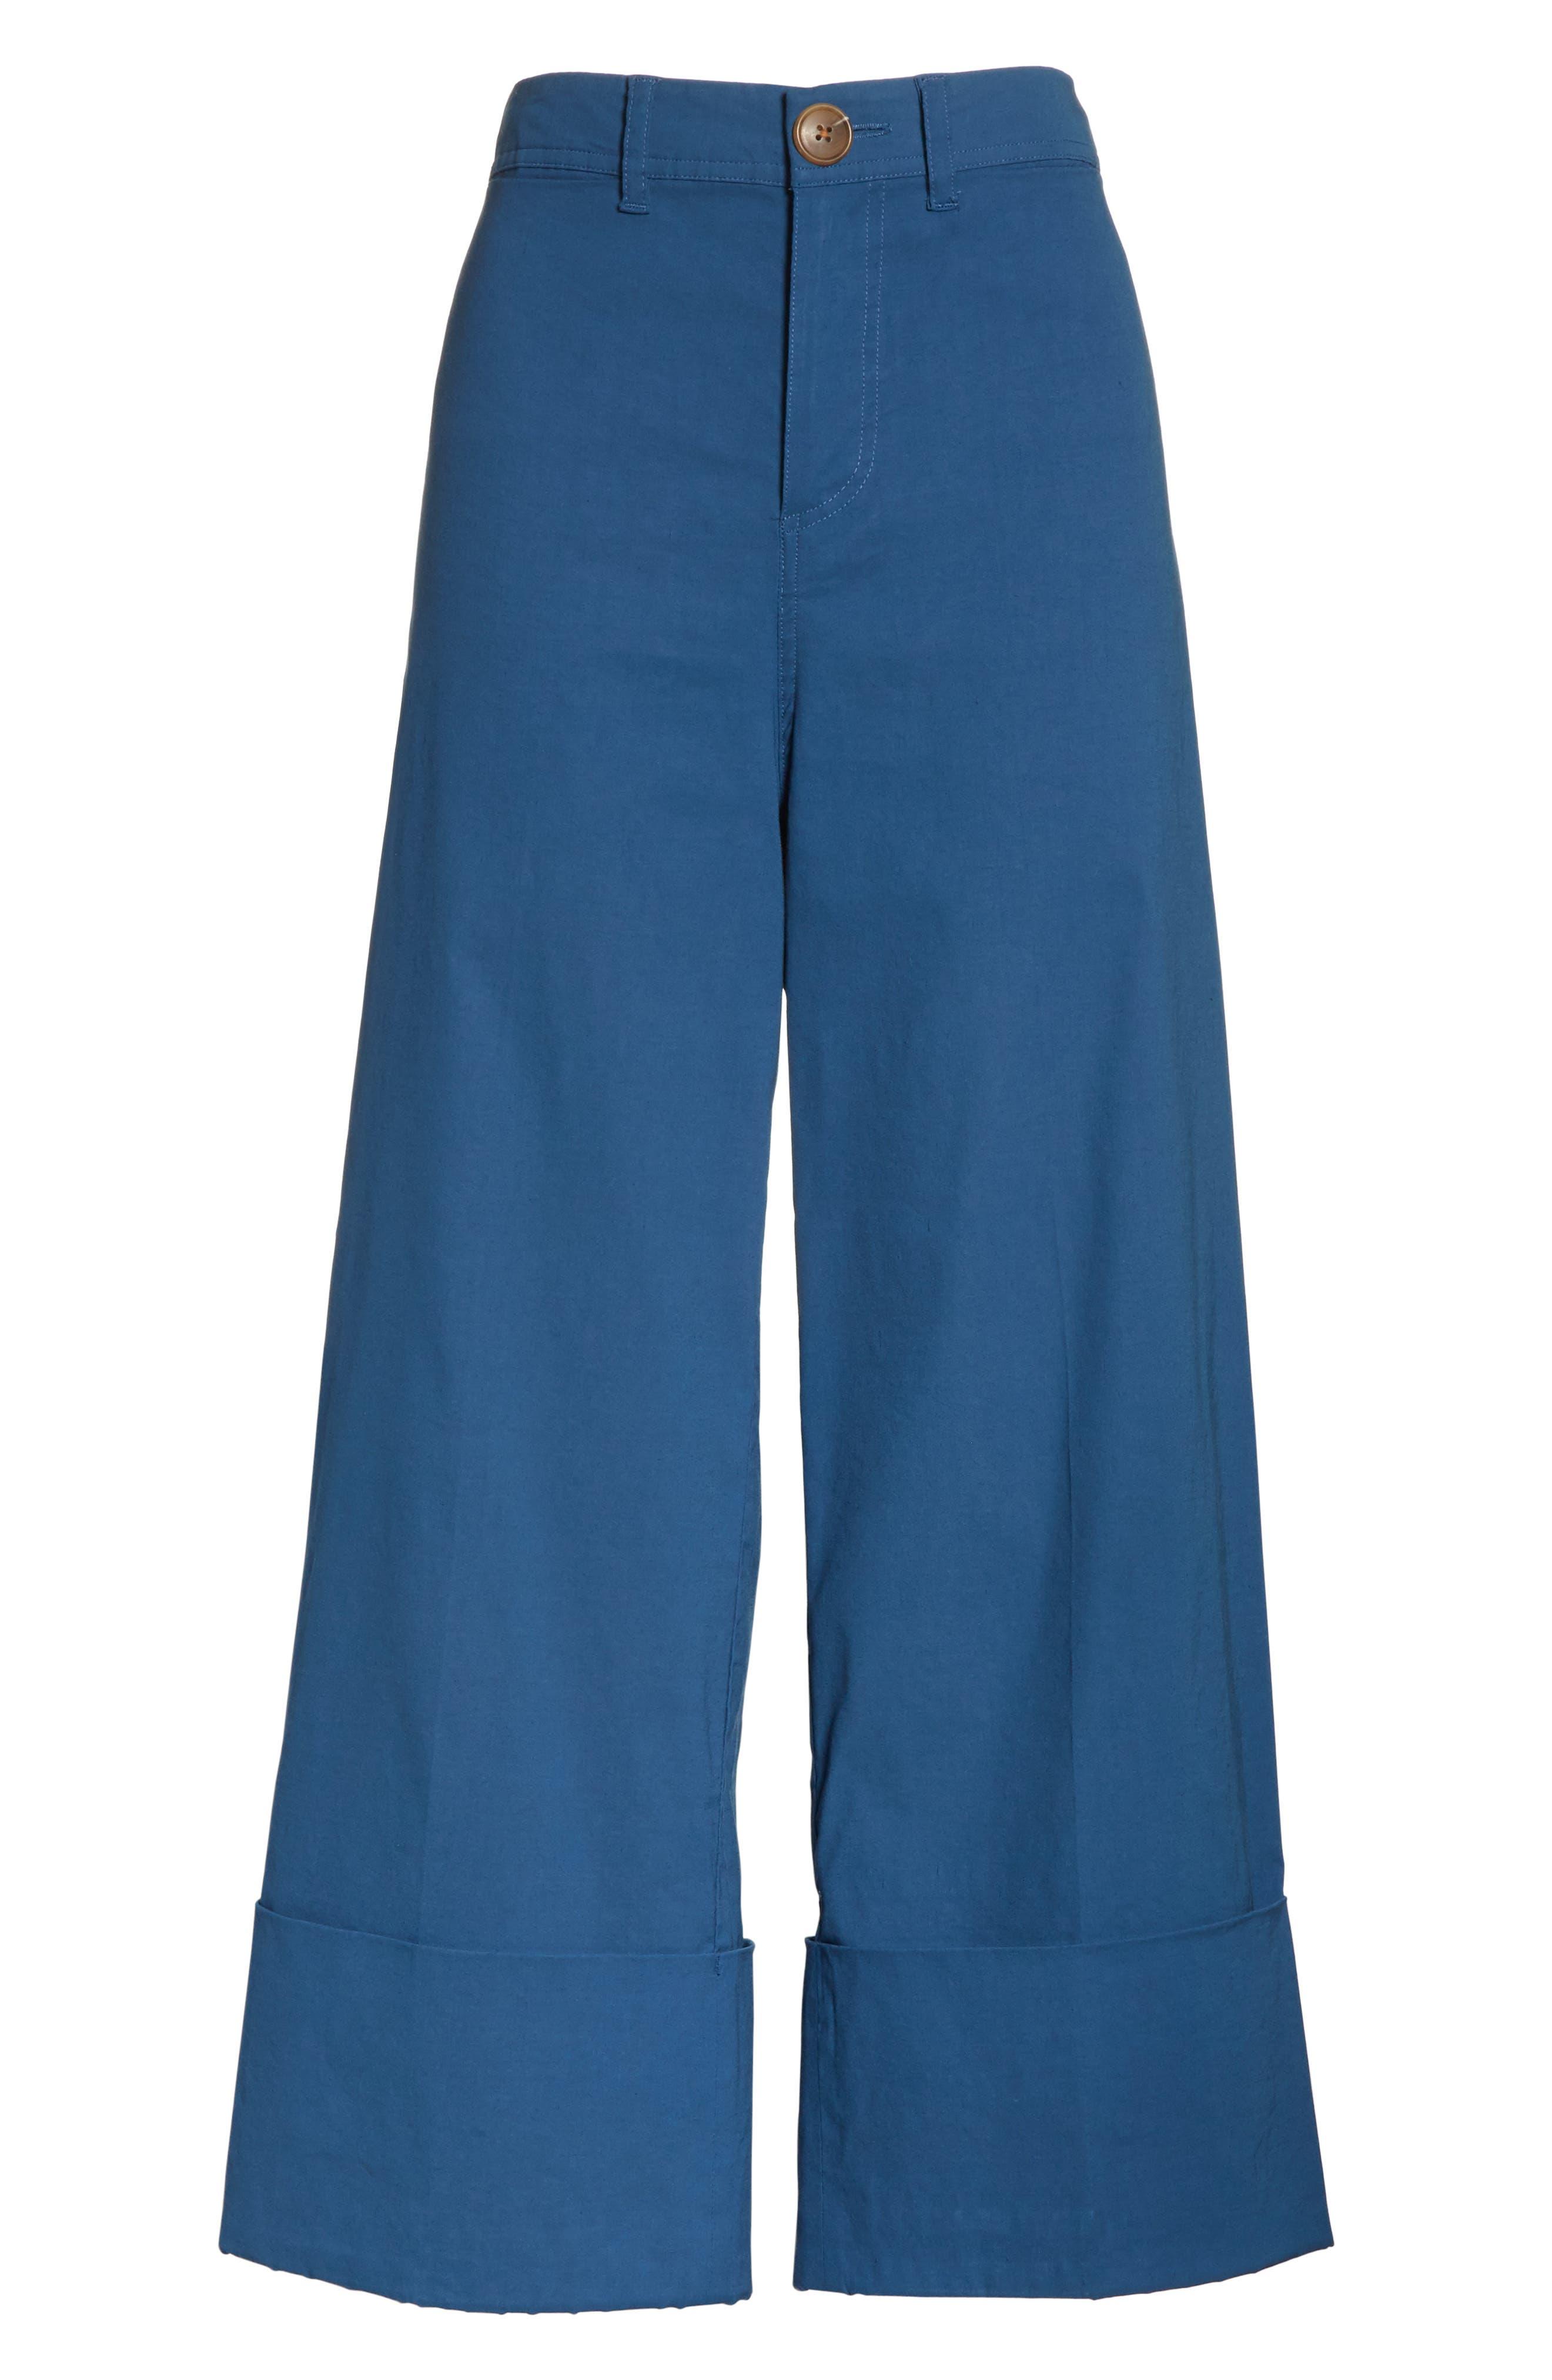 Winona Cuff Wide Leg Pants,                             Alternate thumbnail 6, color,                             Blue